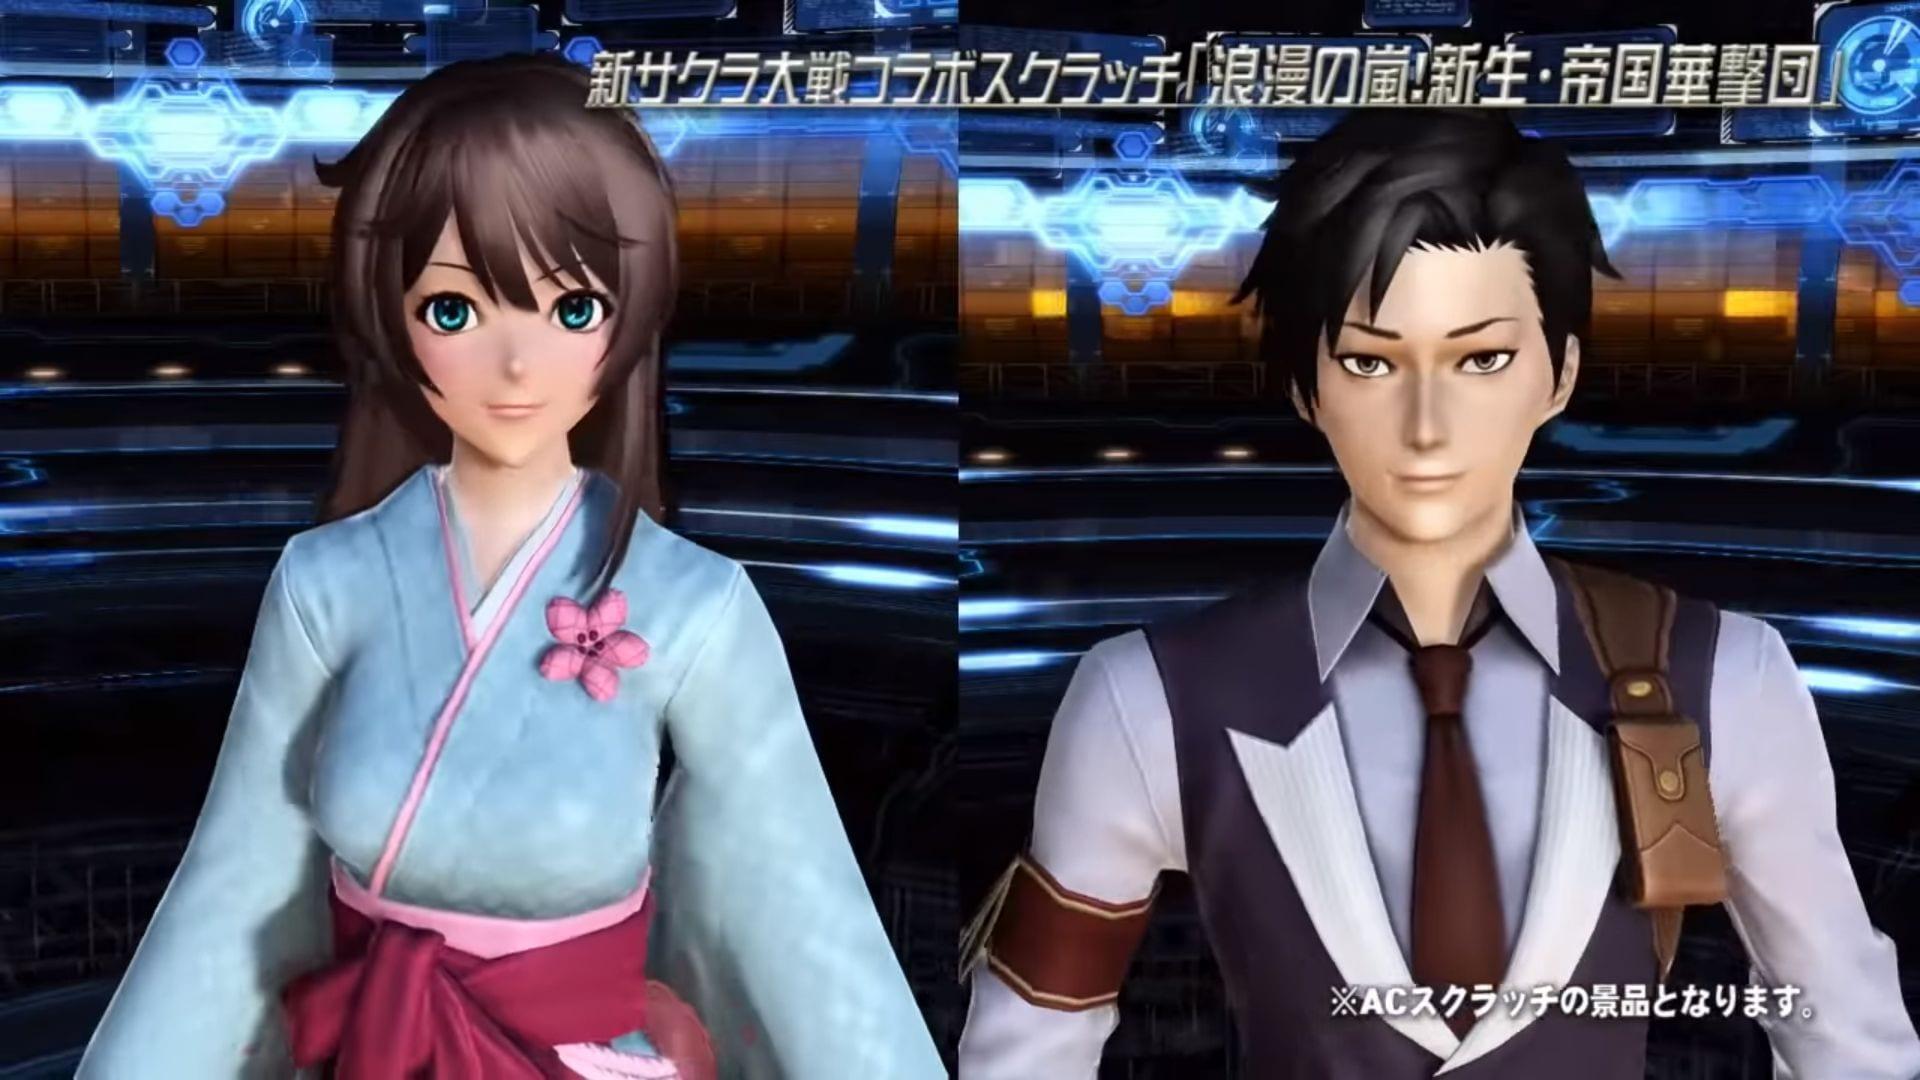 Phantasy Star Online 2 Sakura Wars